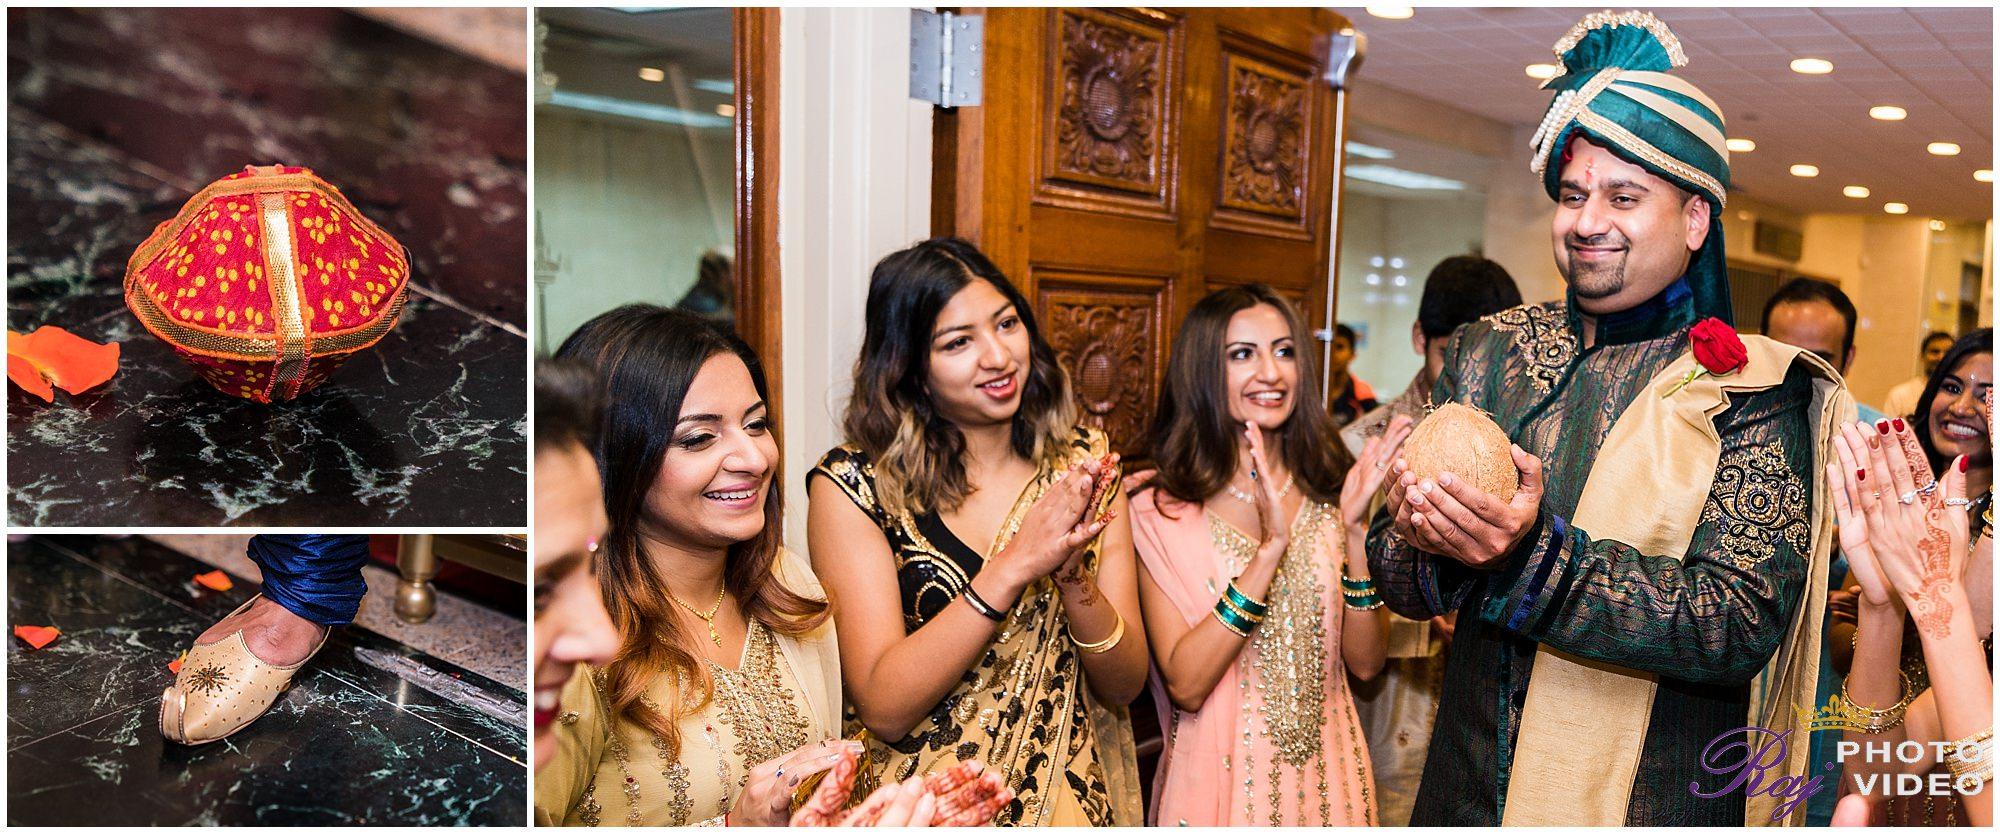 Sri-Guruvaayoorappan-Temple-Marlboro-NJ-Indian-Wedding-Chiyomi-Scott-00015.jpg